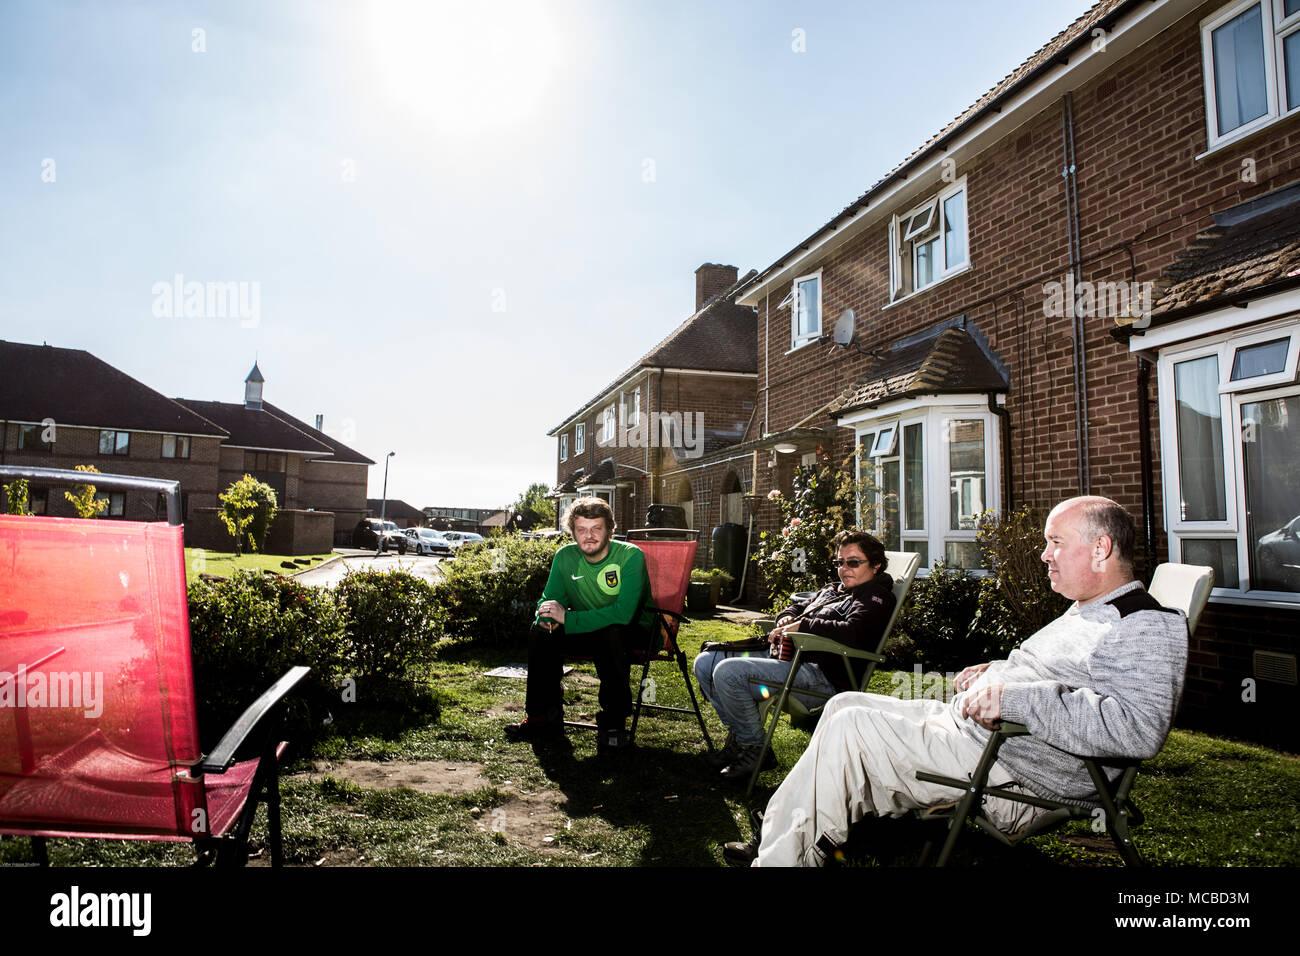 Group of residents sitting outside on social housing estate - Stock Image